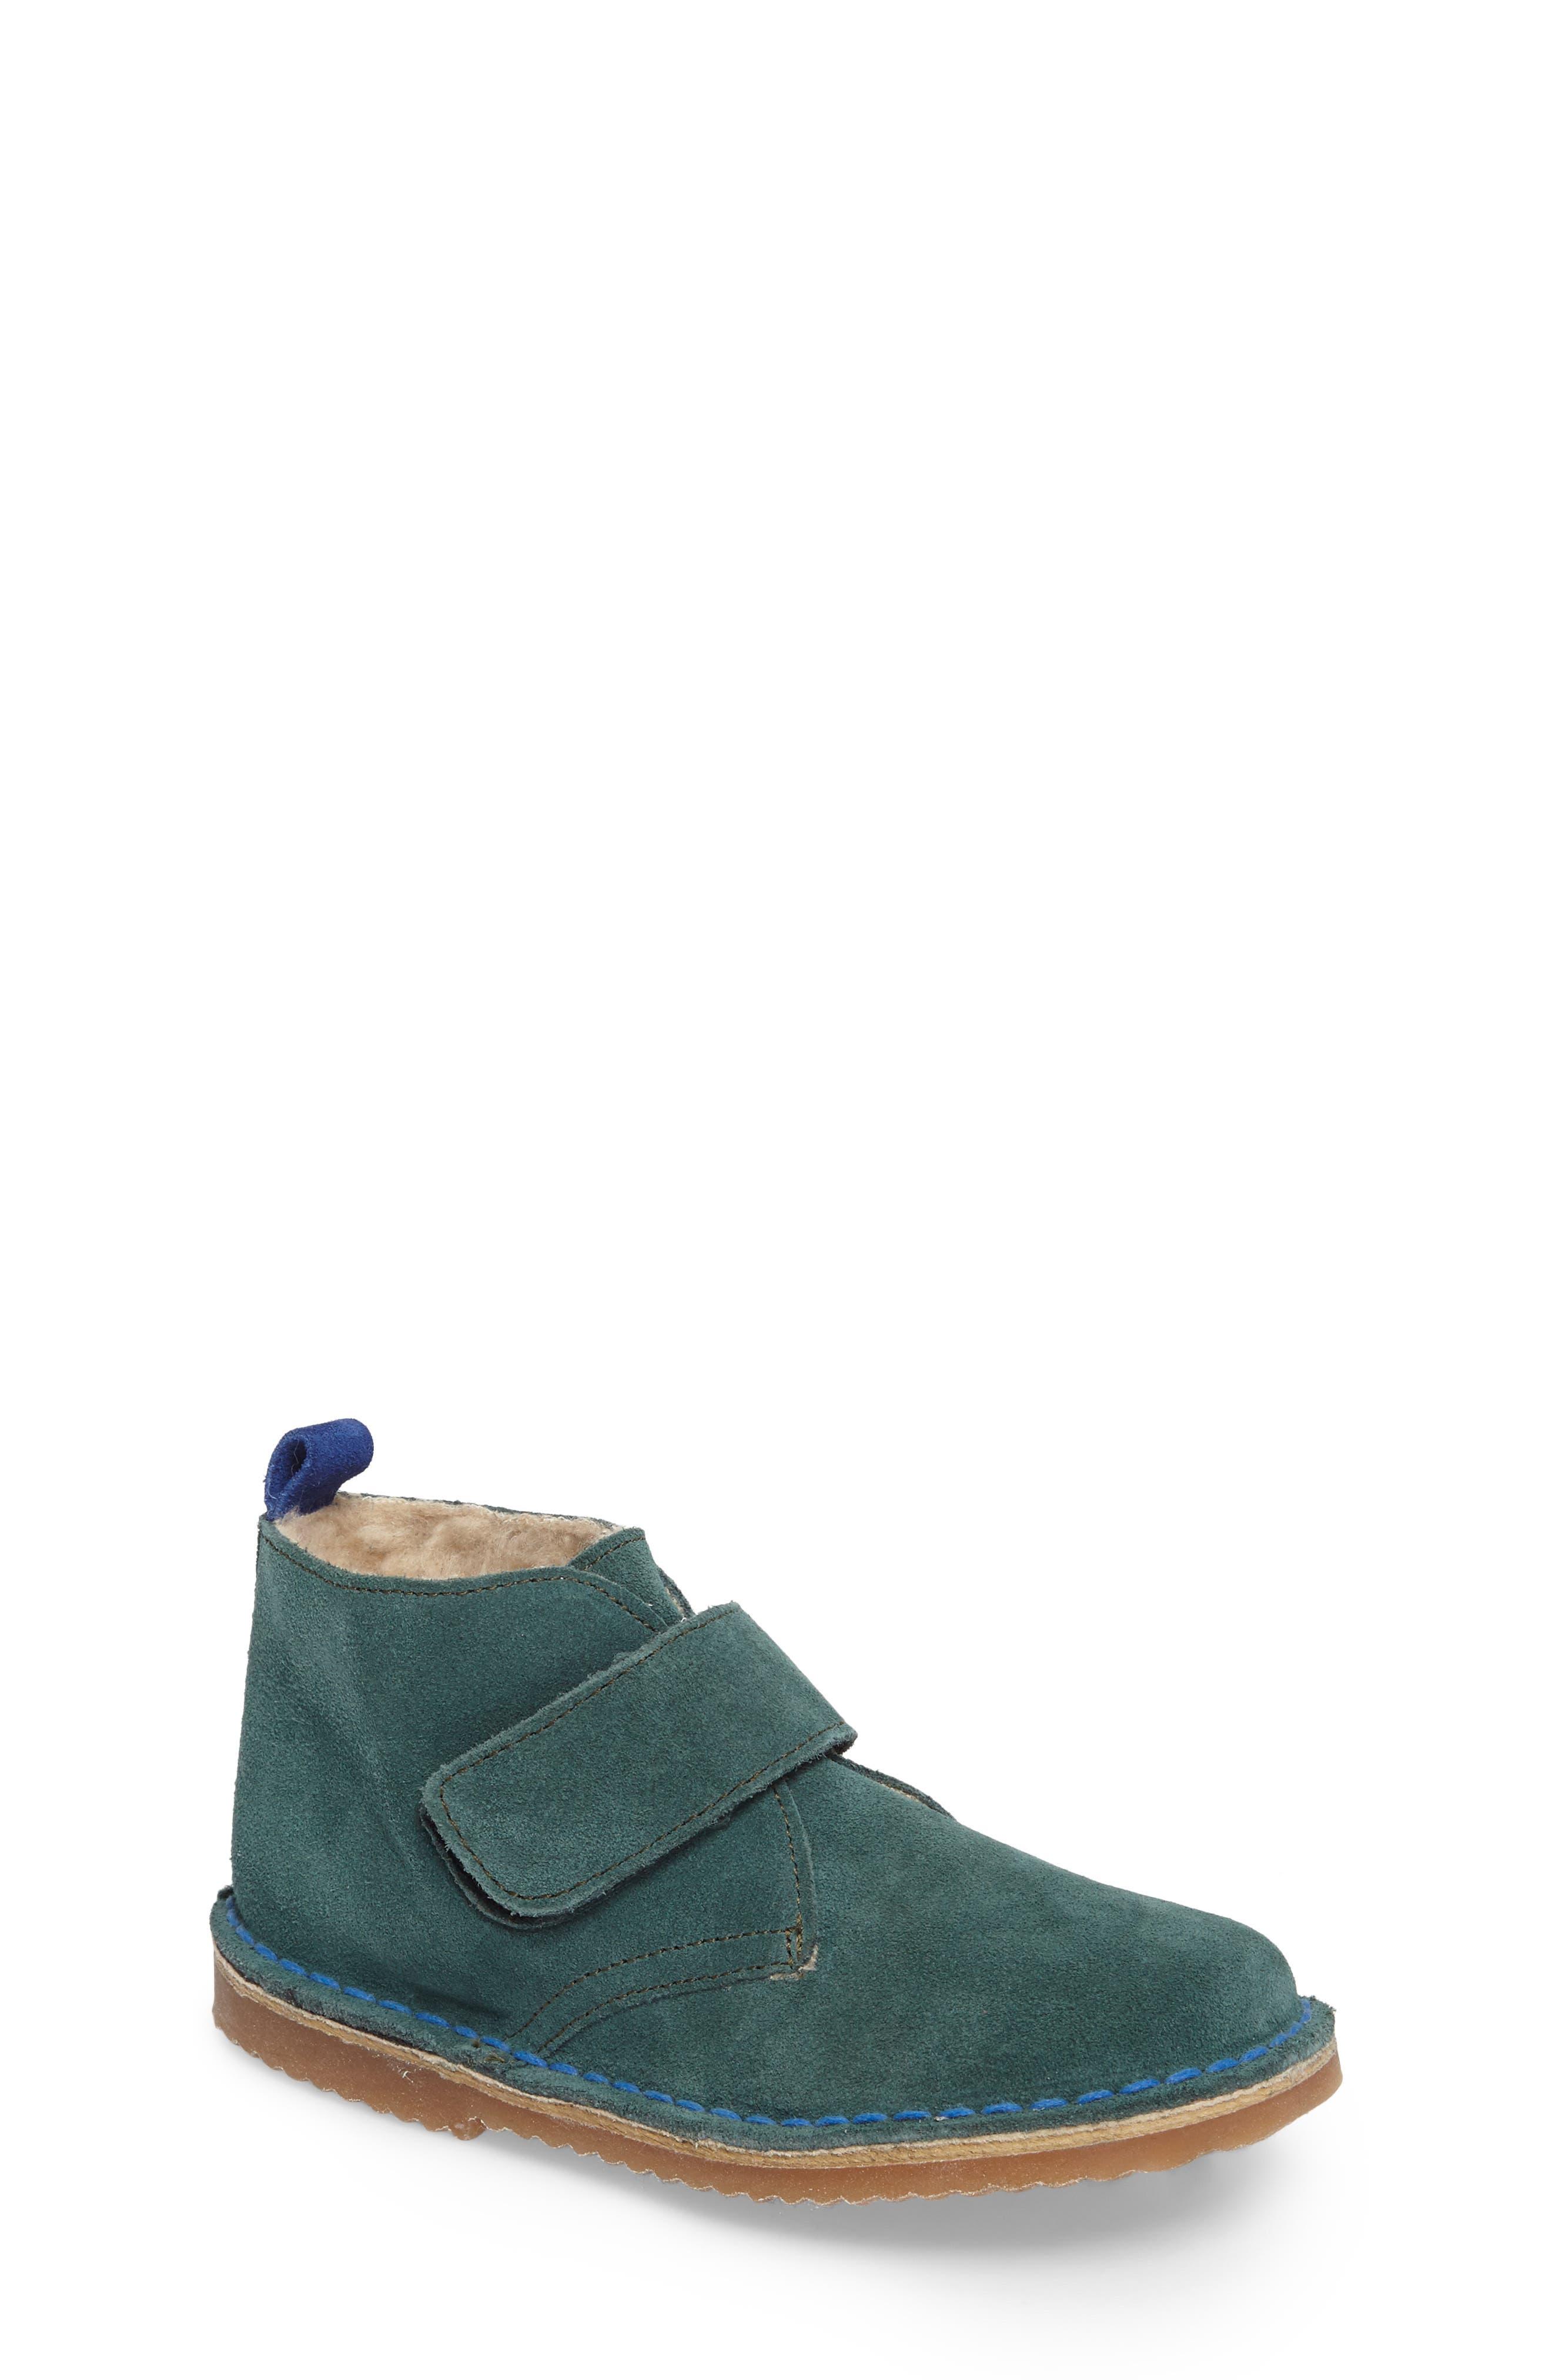 Main Image - Mini Boden Faux Fur Desert Boot (Toddler, Little Kid & Big Kid)